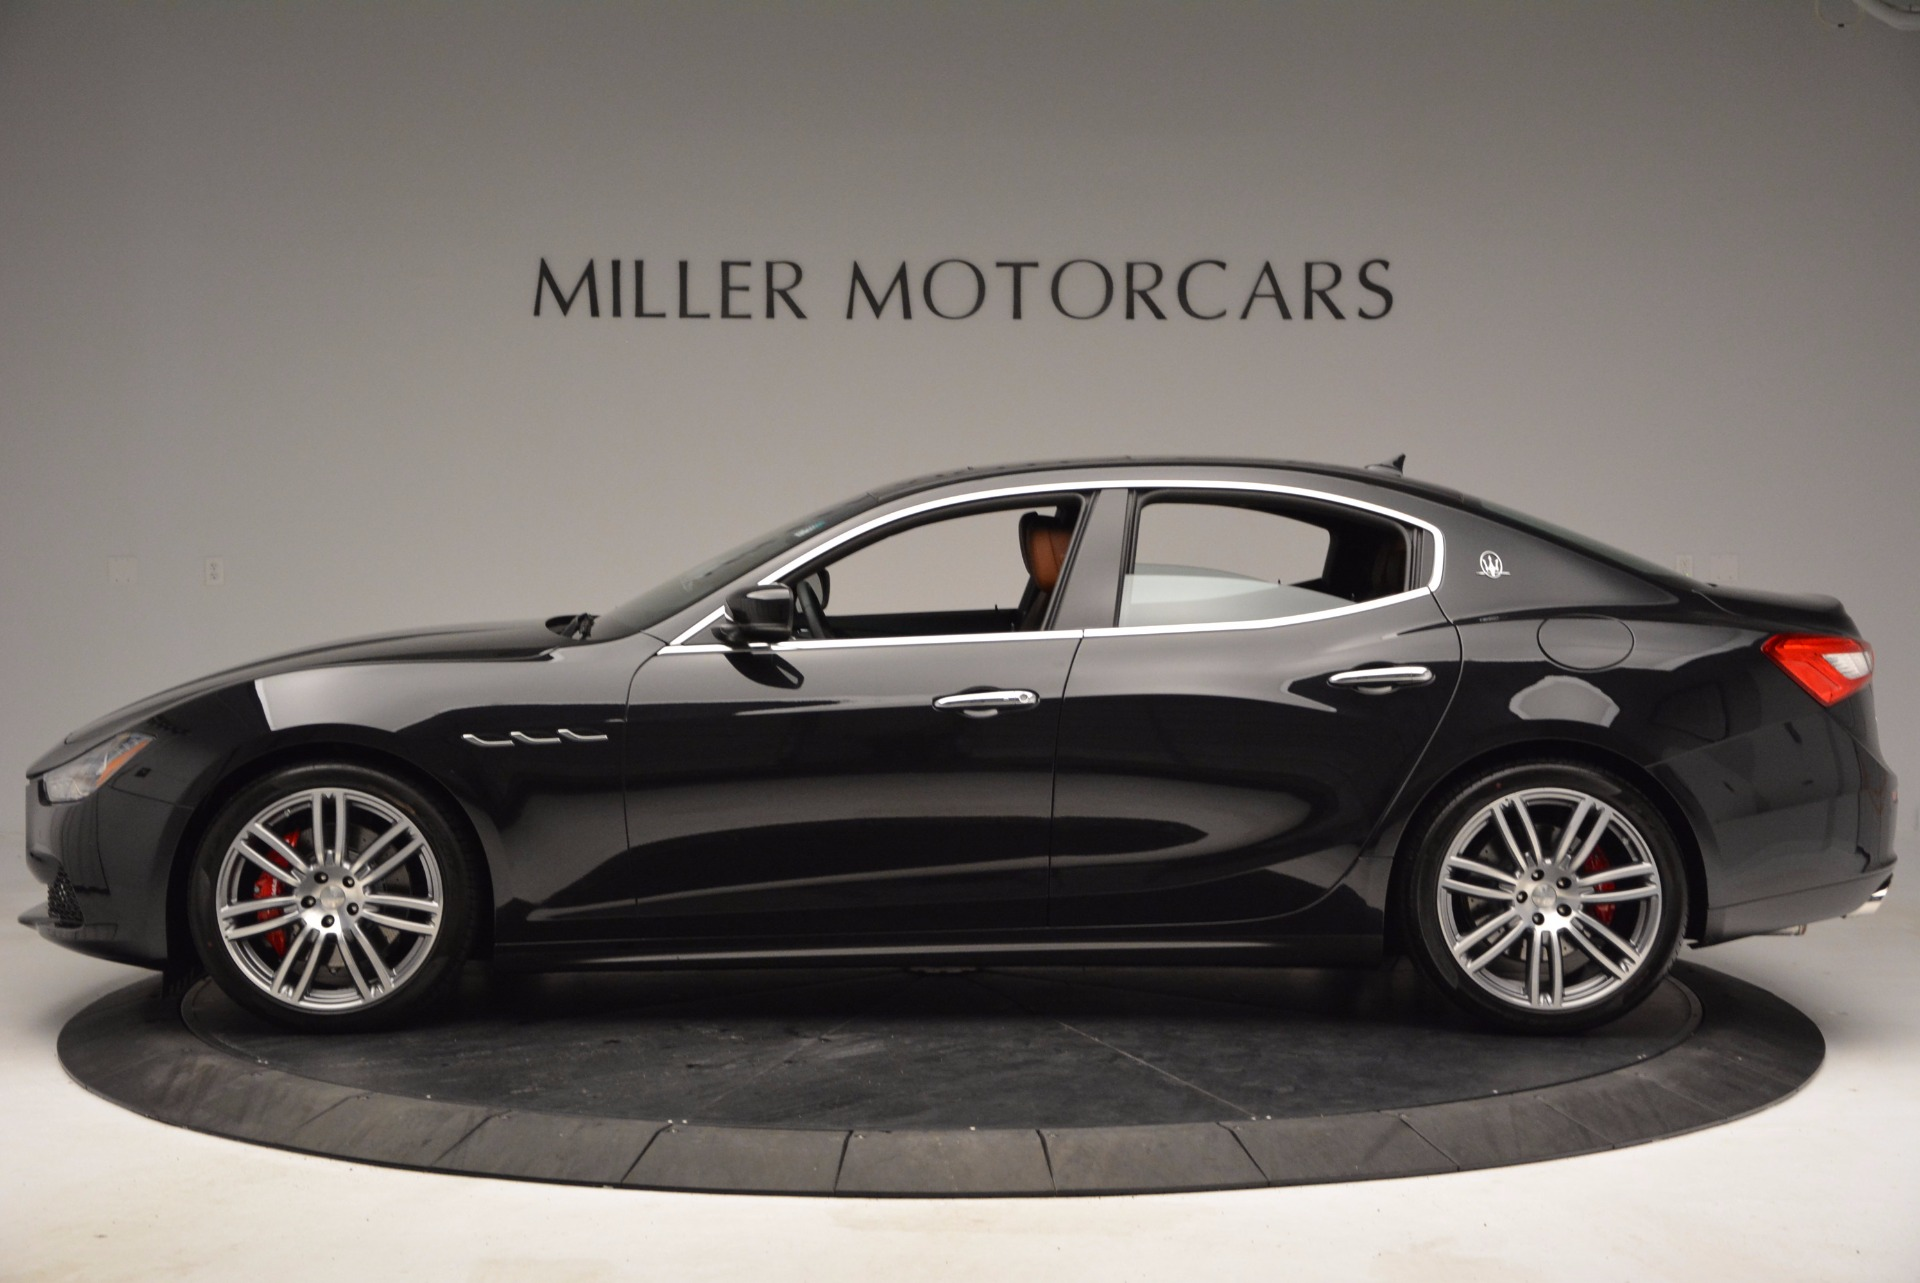 Used 2014 Maserati Ghibli S Q4 For Sale In Greenwich, CT. Alfa Romeo of Greenwich, 7281 1587_p3